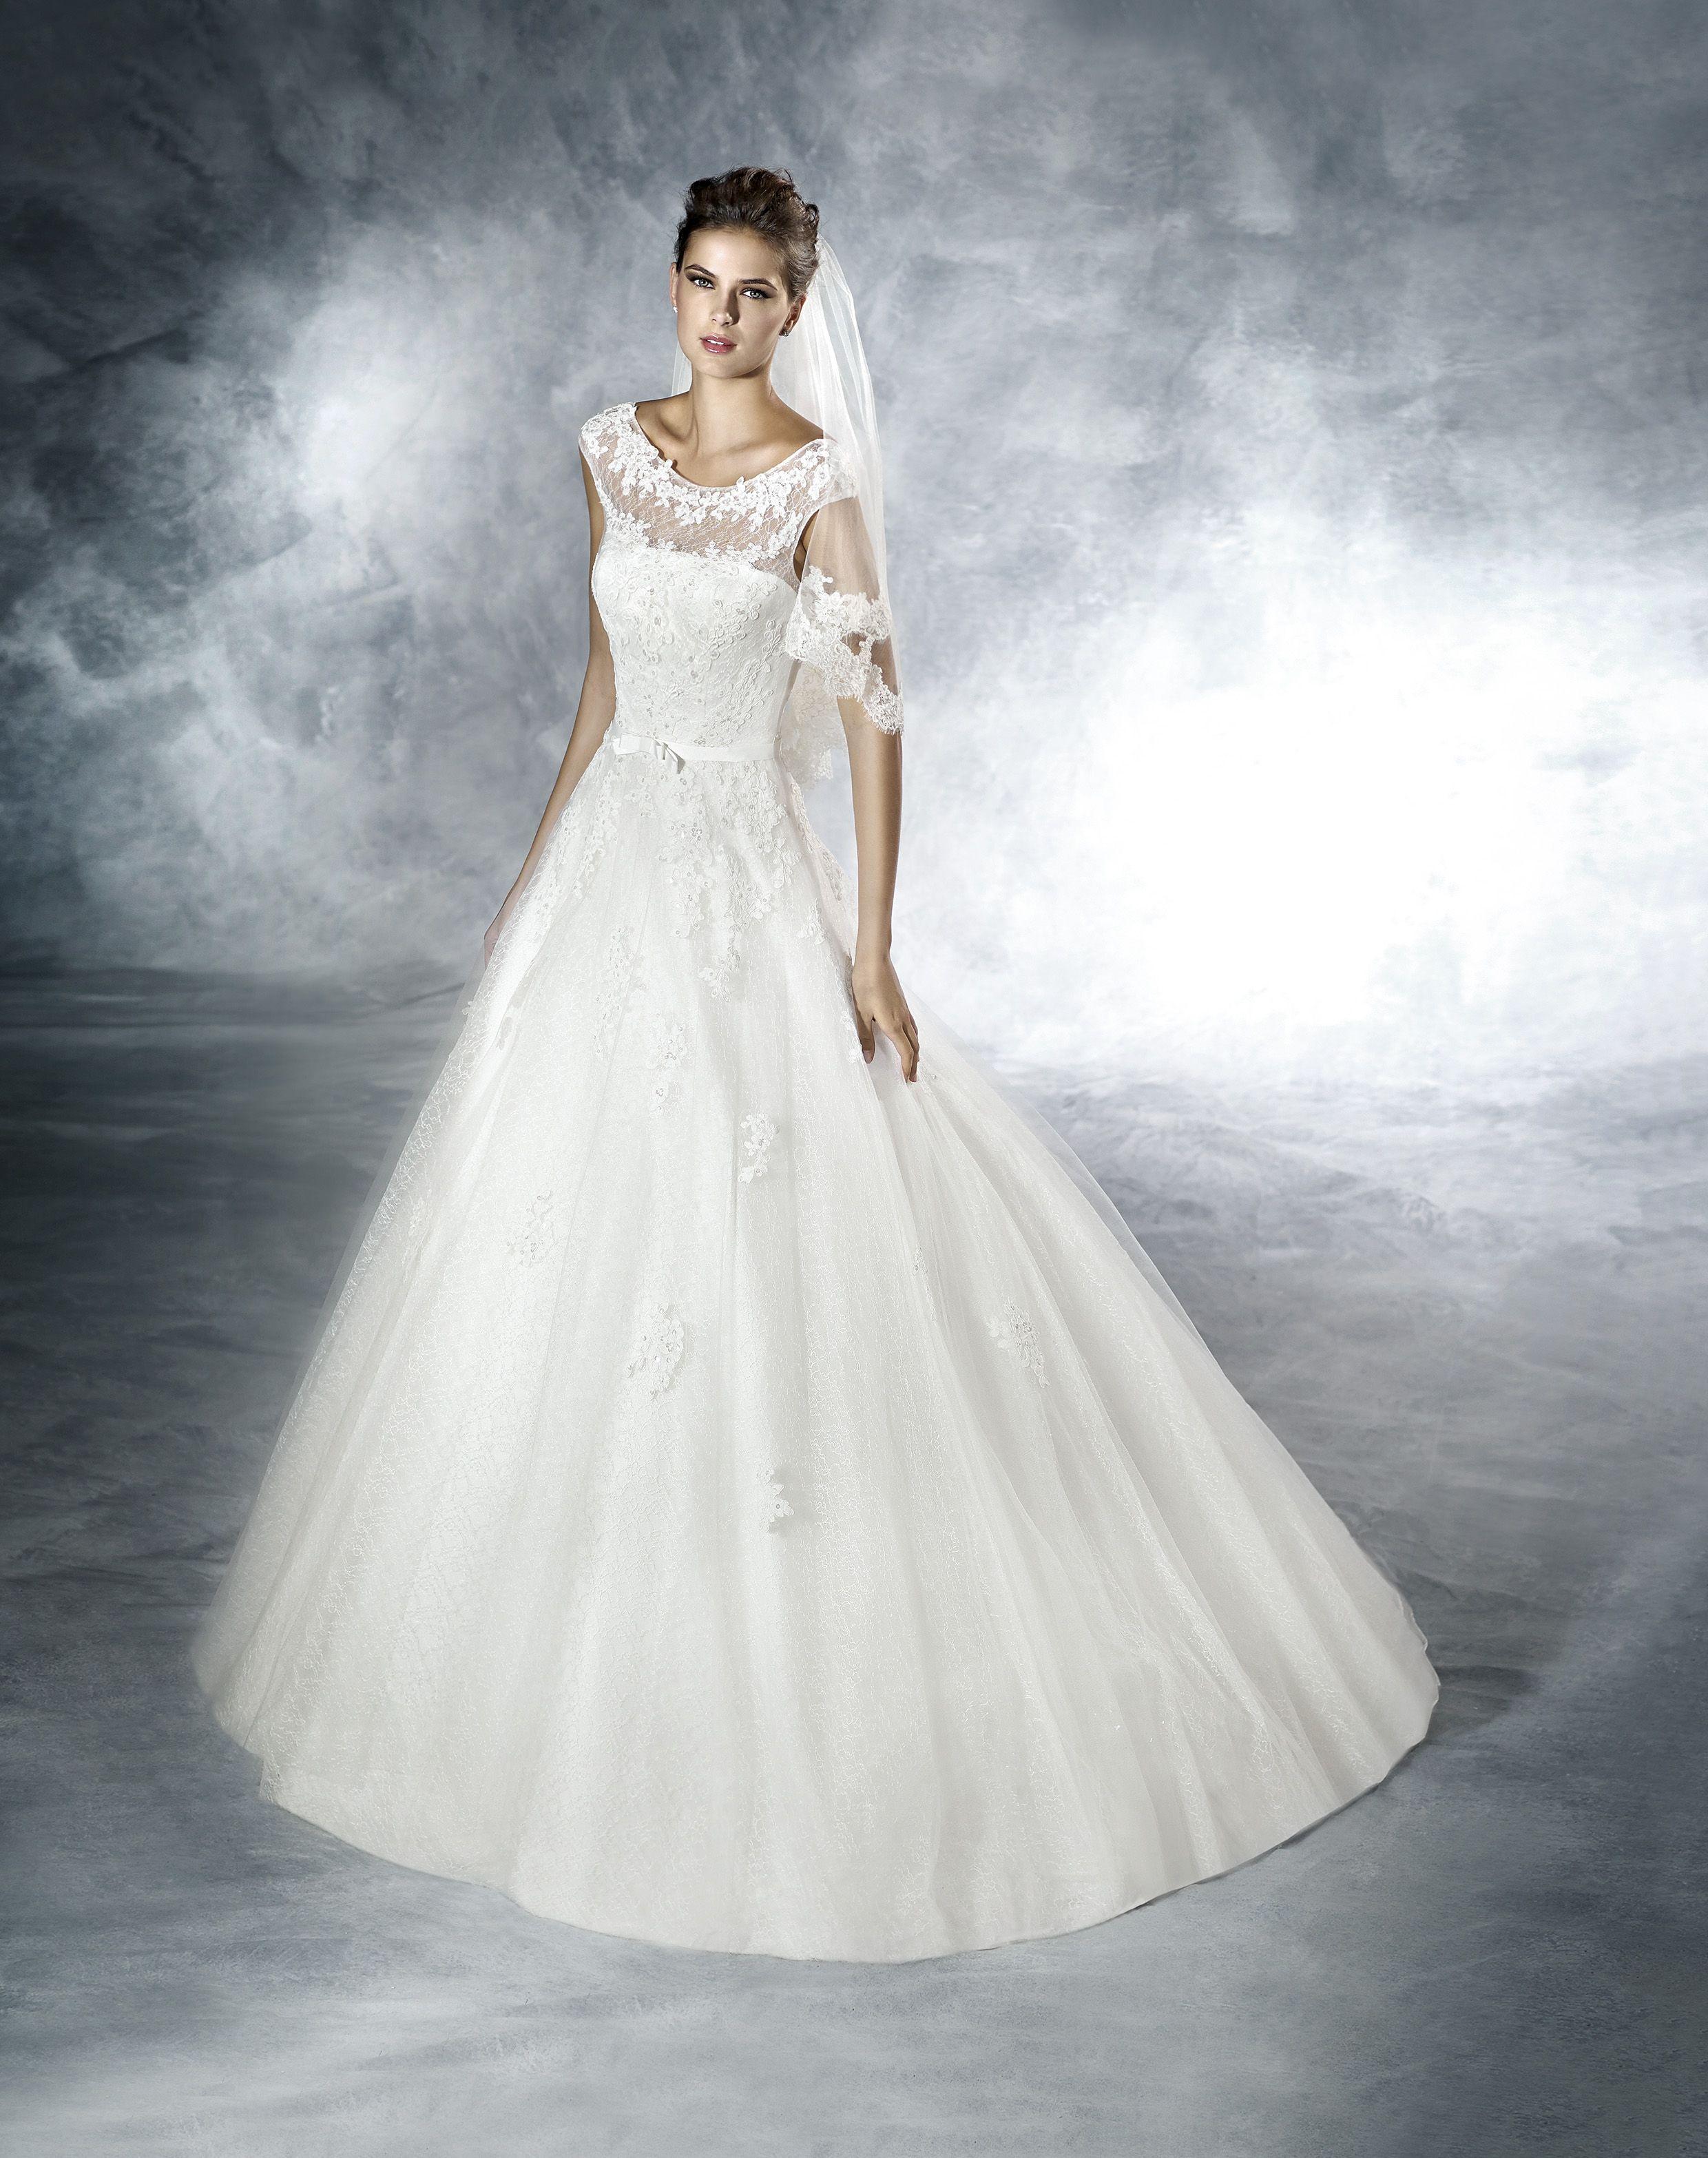 Pin by ODIVA Wedding Dresses on WHITE ONE 2016 | Pinterest